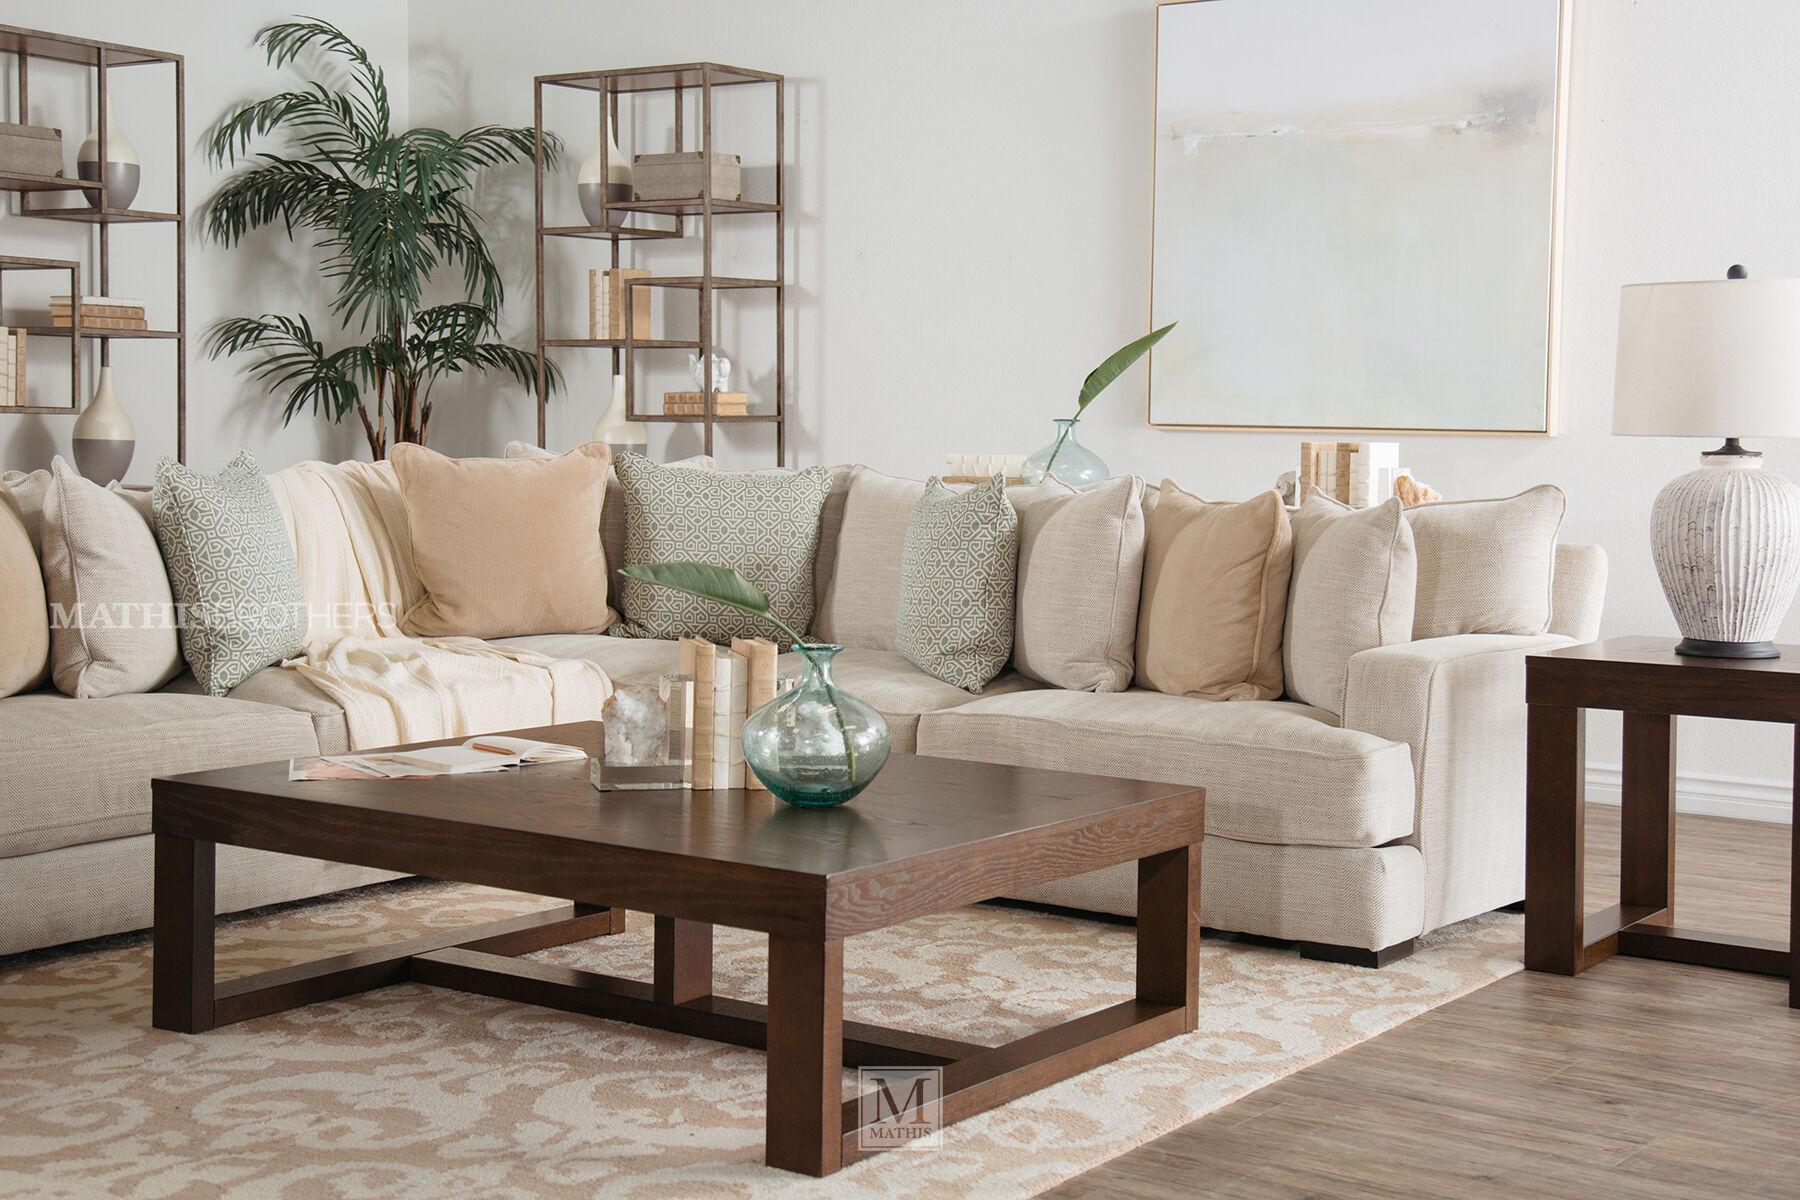 watson sofa table bed lipat jakarta jonathan louis matthew three piece sectional mathis